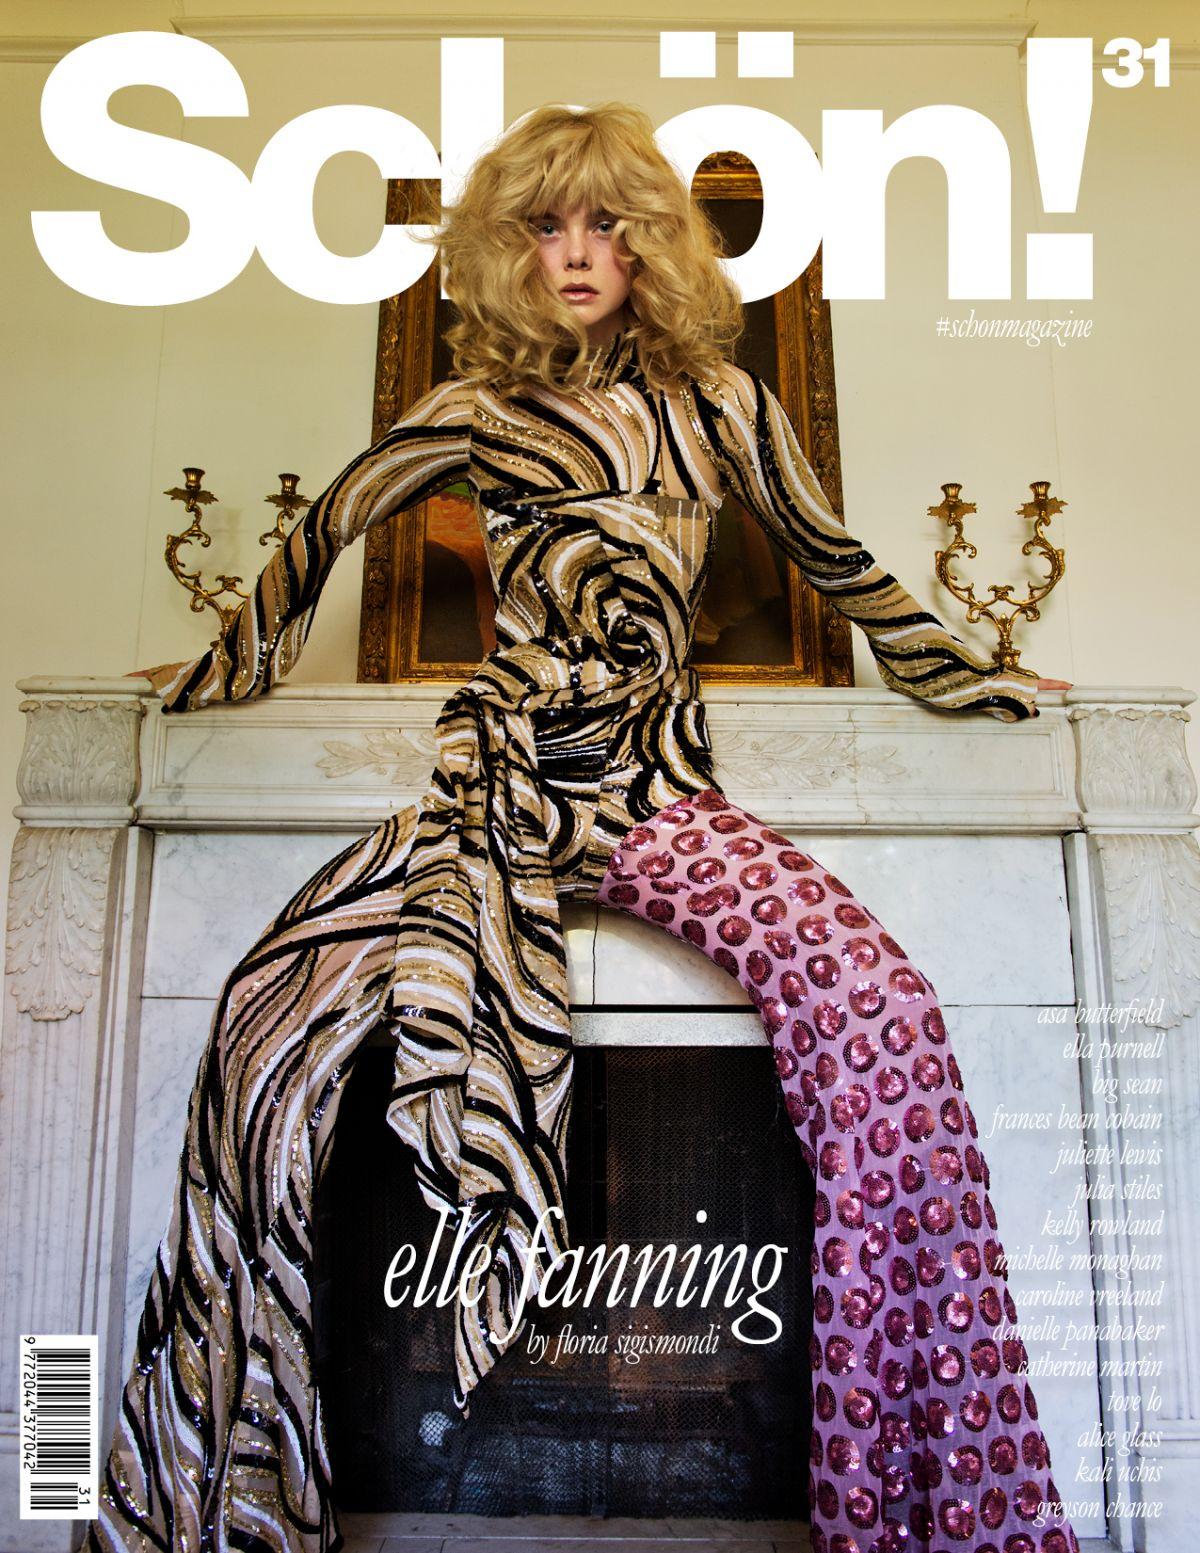 ELLE FANNING in Schon! Magazine #31, October 2016